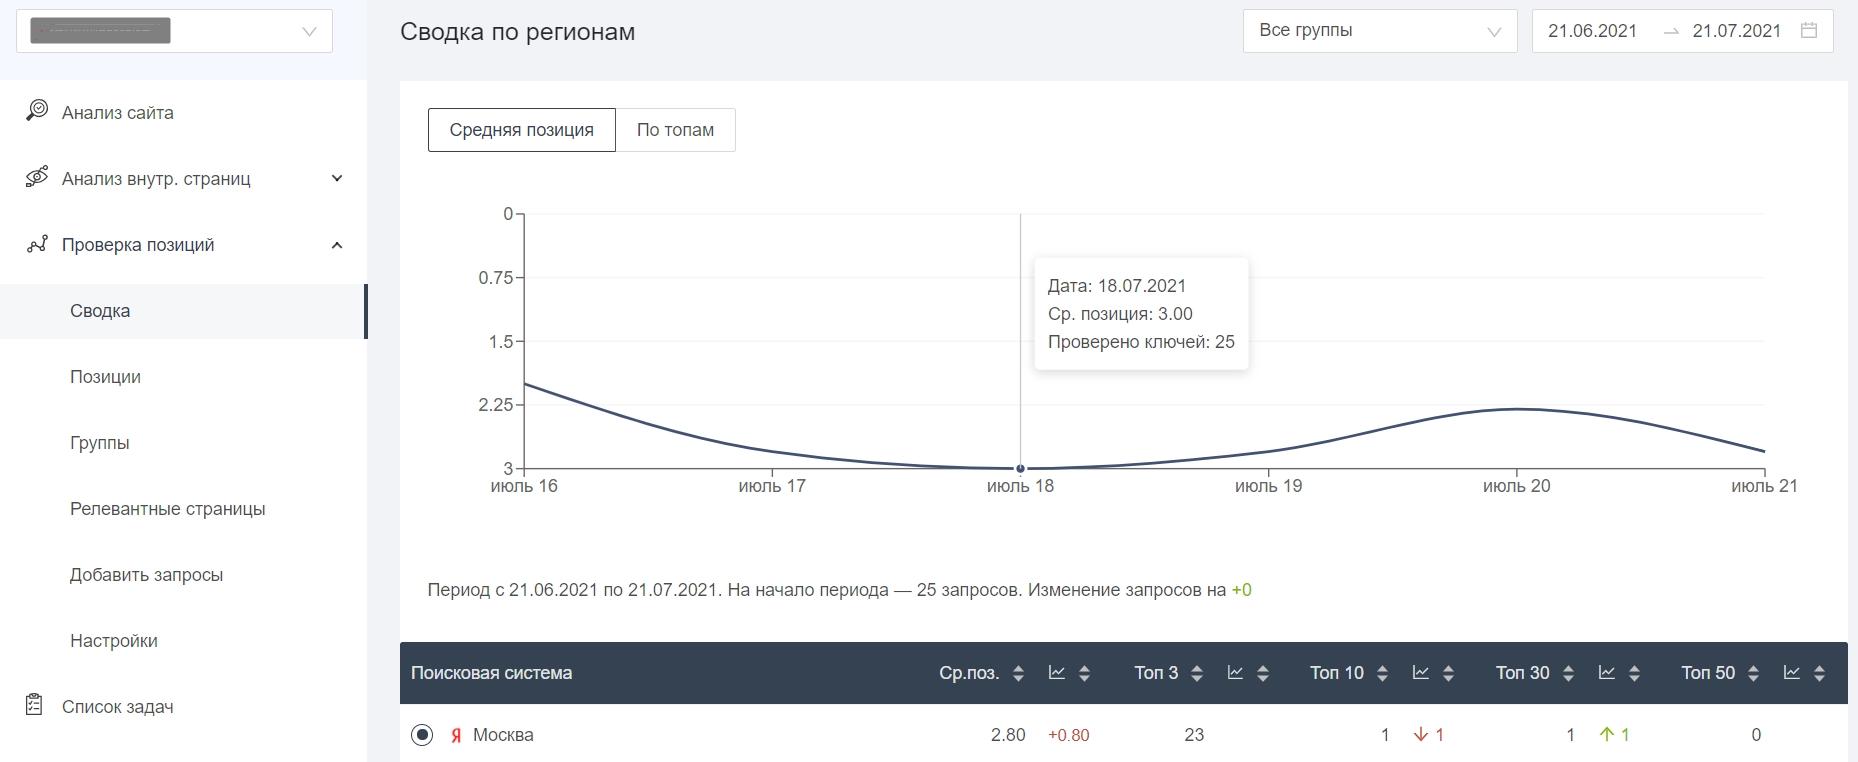 Кейс: как картинка на сайте повлияла на ранжирование в Google 4